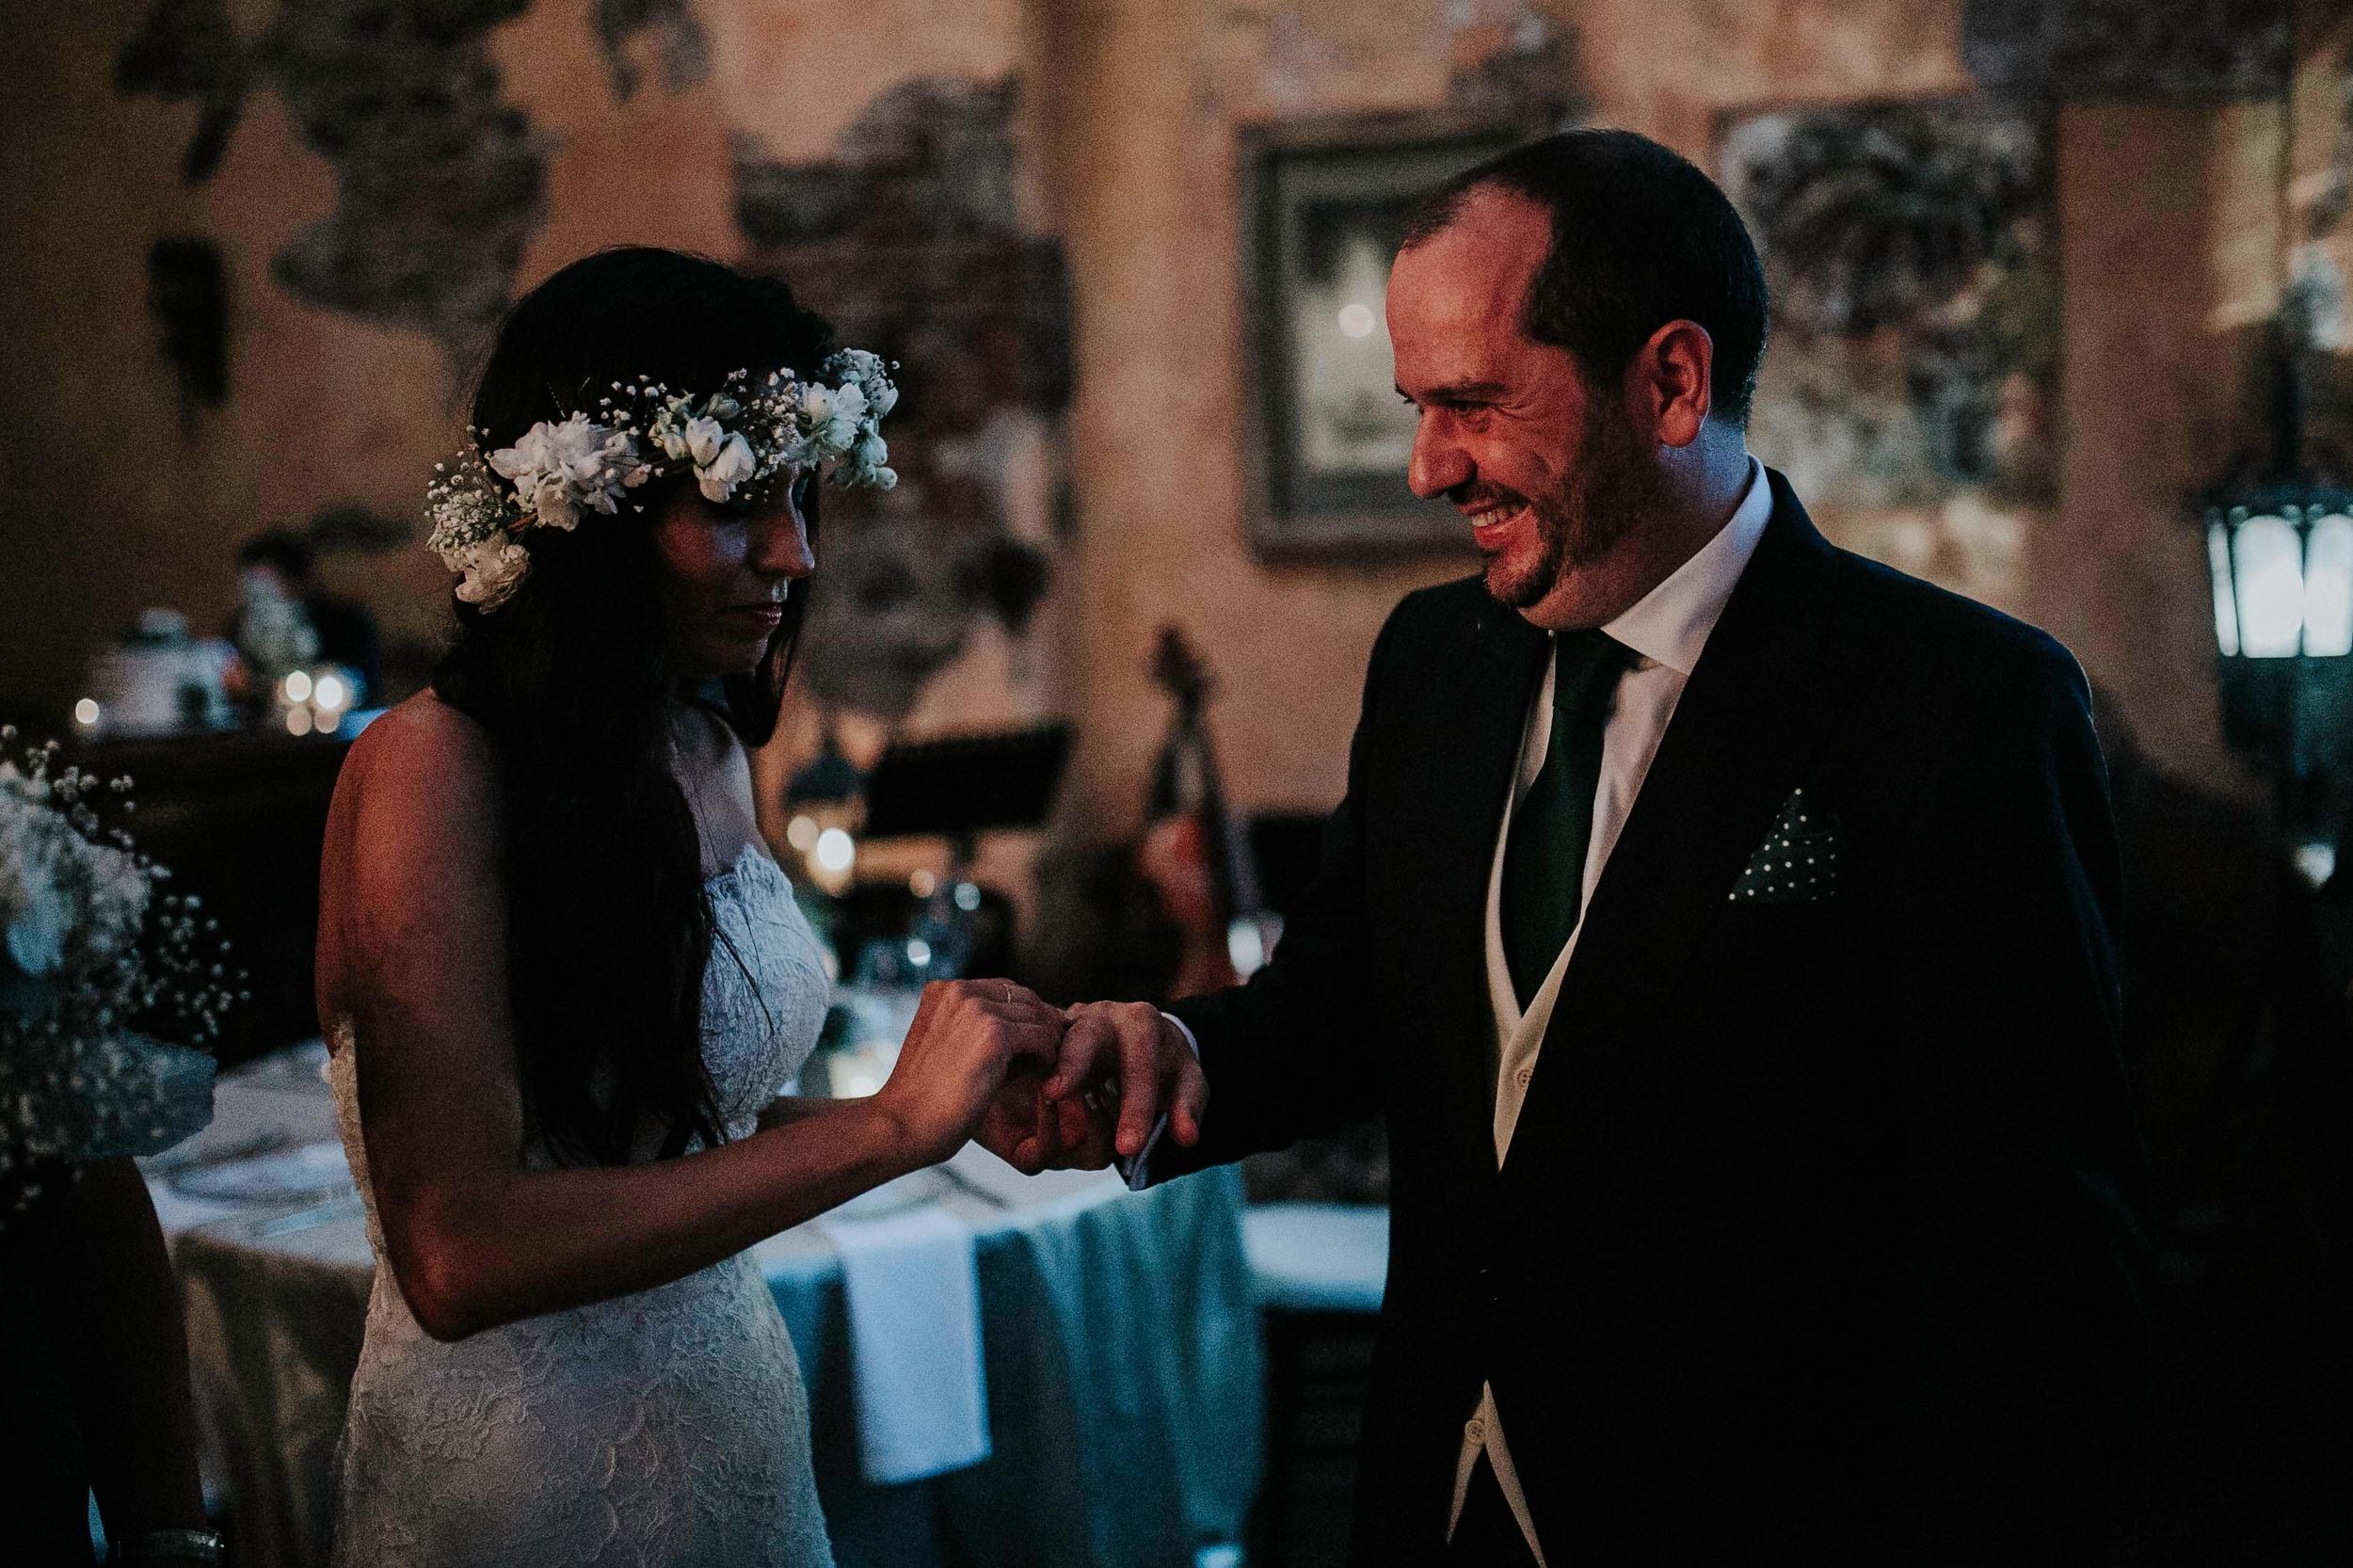 643A2112-Editaralfonso_flores_destination_wedding_photographer_San_gabriel_de_las_palmas.jpg